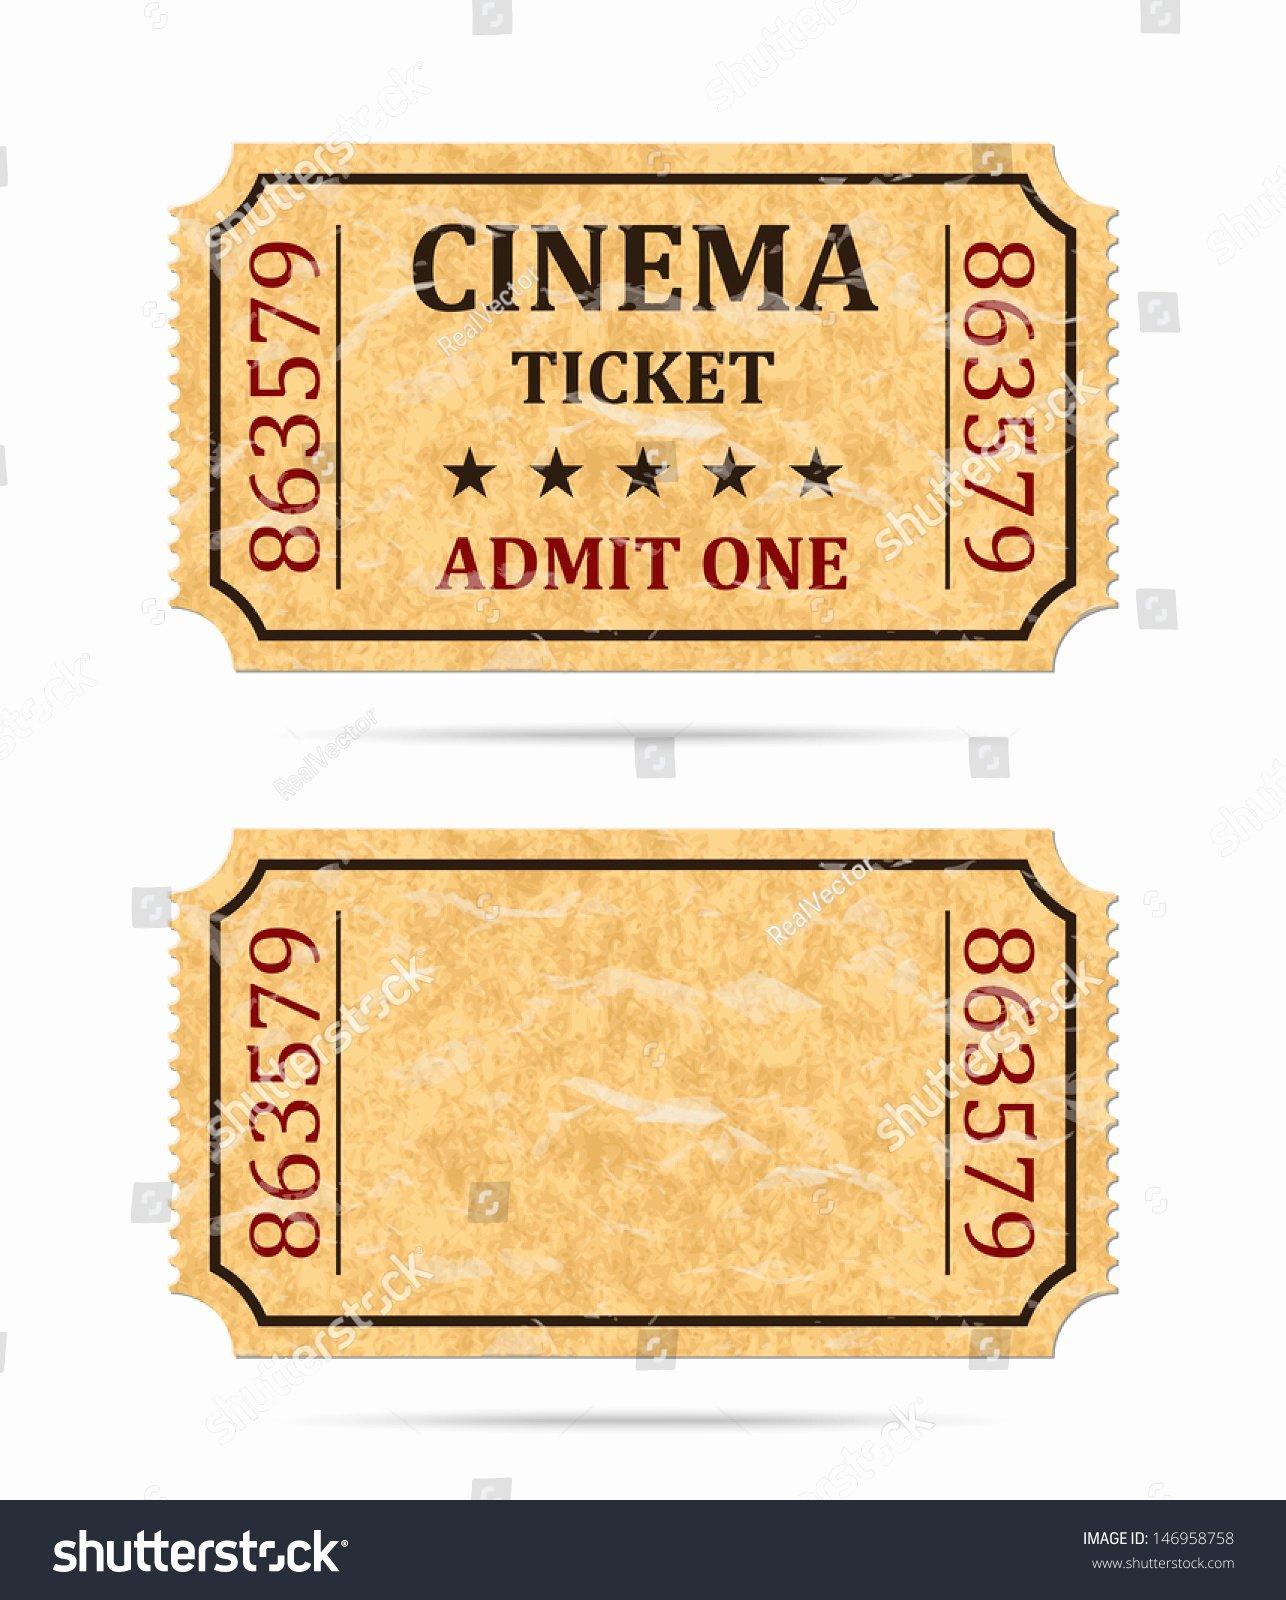 Vintage Movie Ticket Template Beautiful Retro Cinema Ticket Empty Ticket Stock Vector